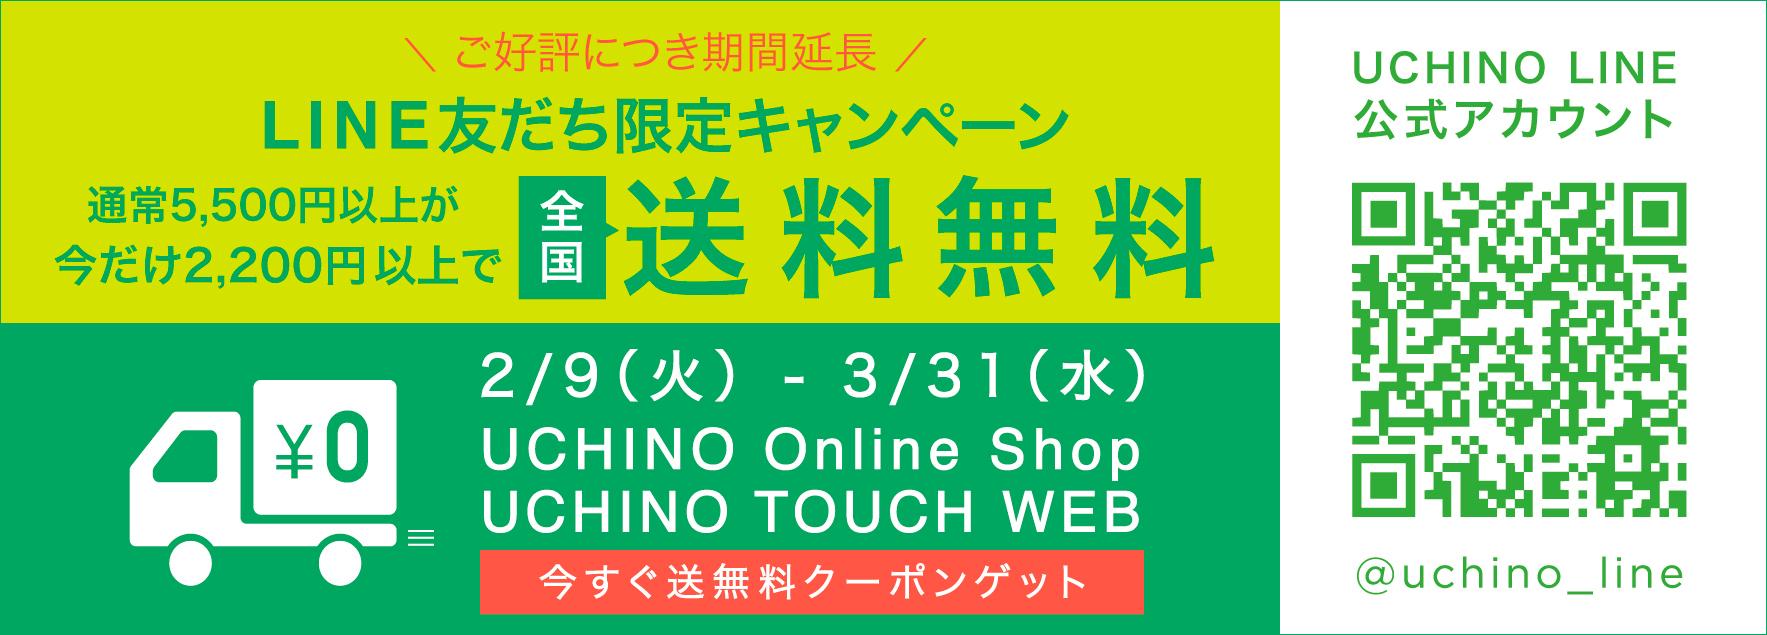 LINE 友だち限定送料無料キャンペーン開催